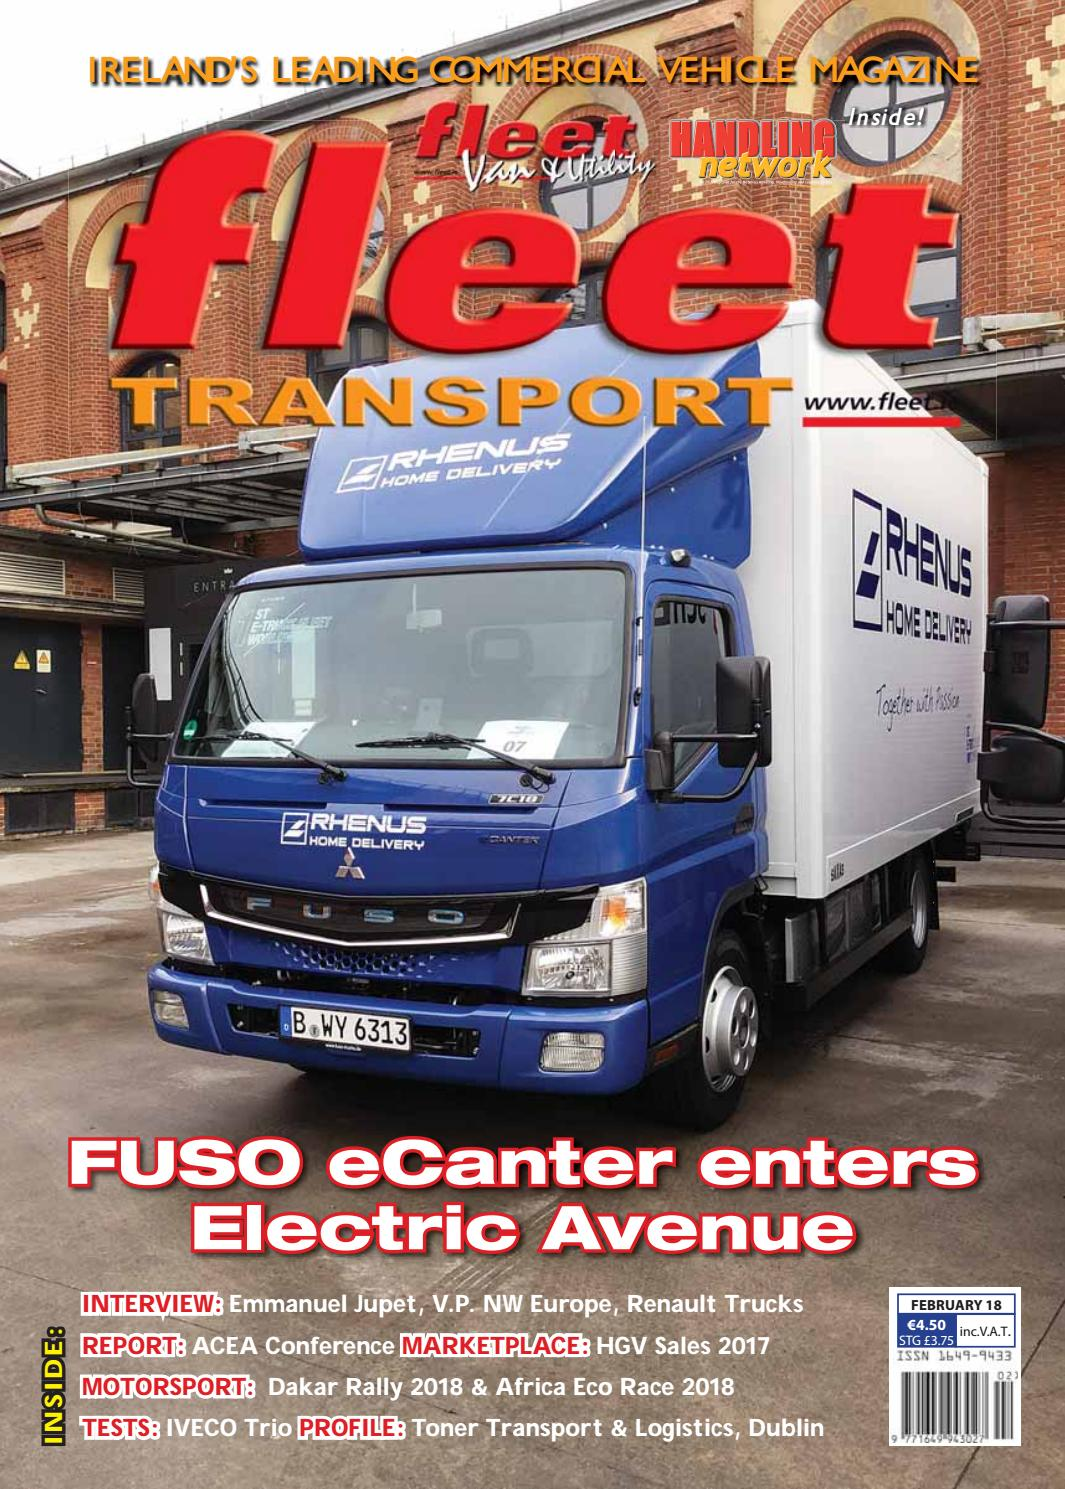 Fleet transport feb18 webfull by Fleet Transport - issuu